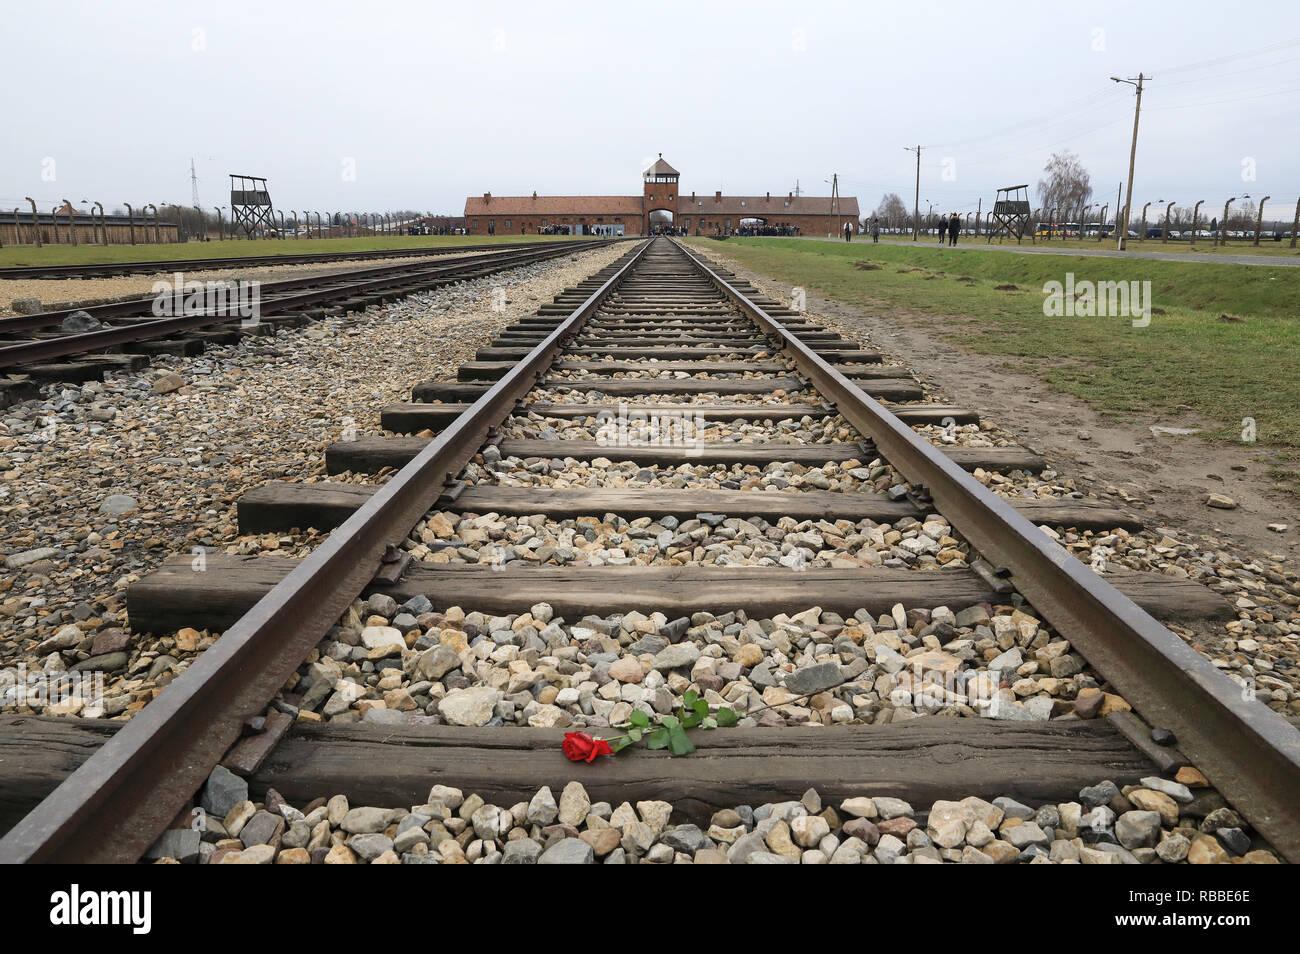 The rails entering the grim extermination camp of Auschvitz 11 Berkenau, near Krakow, Poland - Stock Image